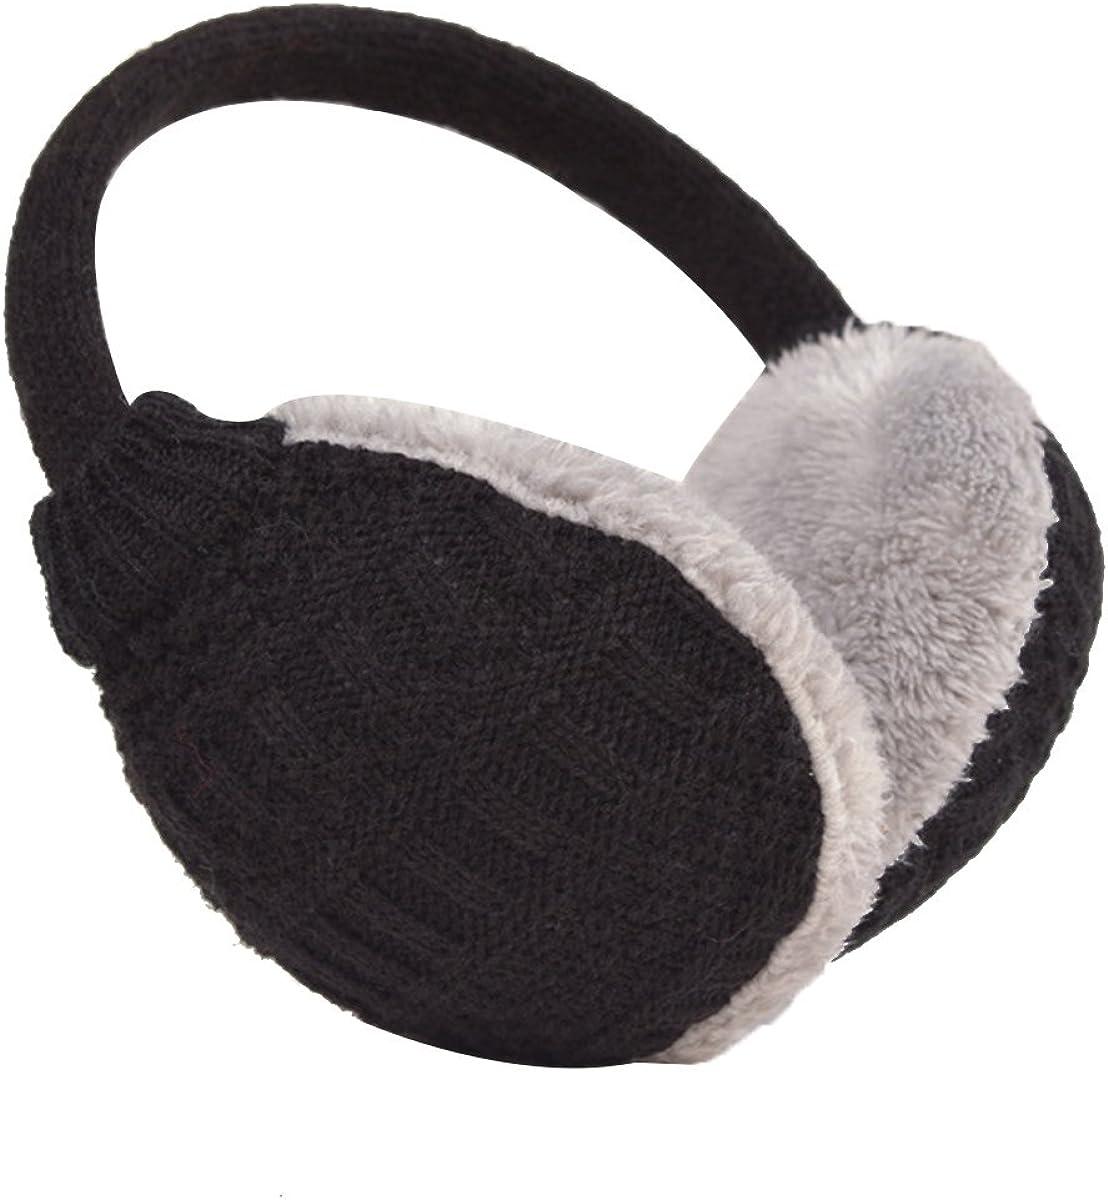 KESYOO Unisex Knit Earmuffs Furry Ear Warmer Winter Ear Covers Detachable to Wash for Outdoor Sports (Black)